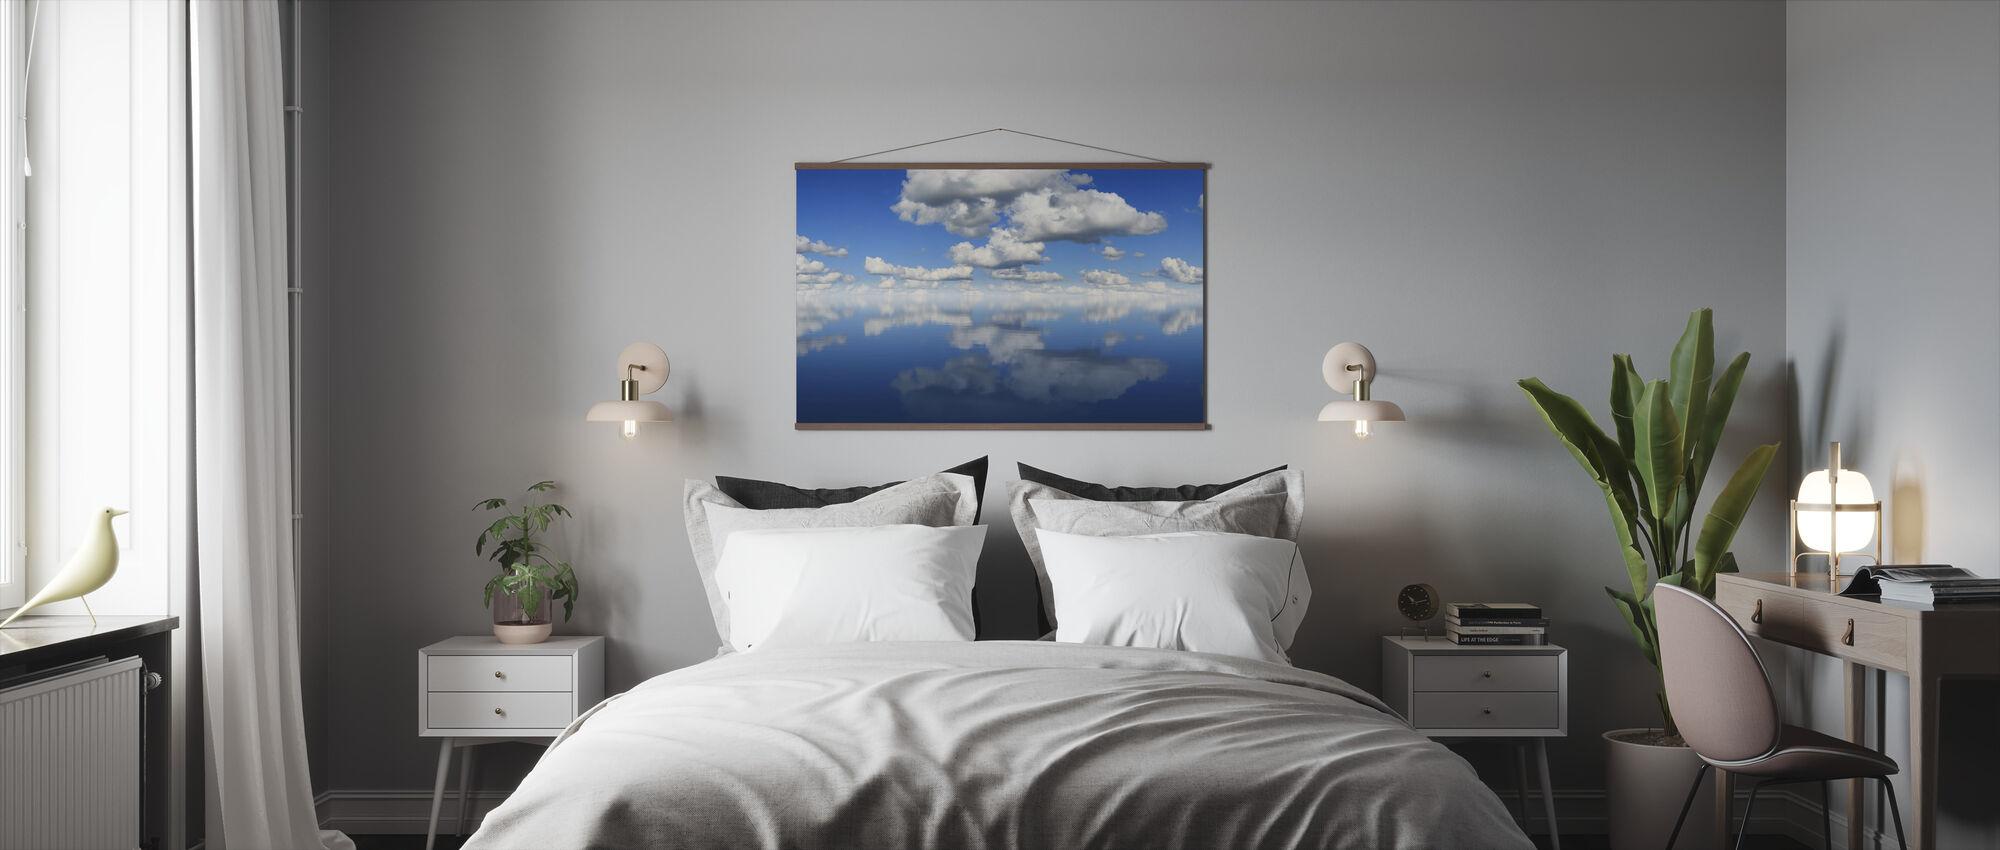 Spegel Hav - Poster - Sovrum